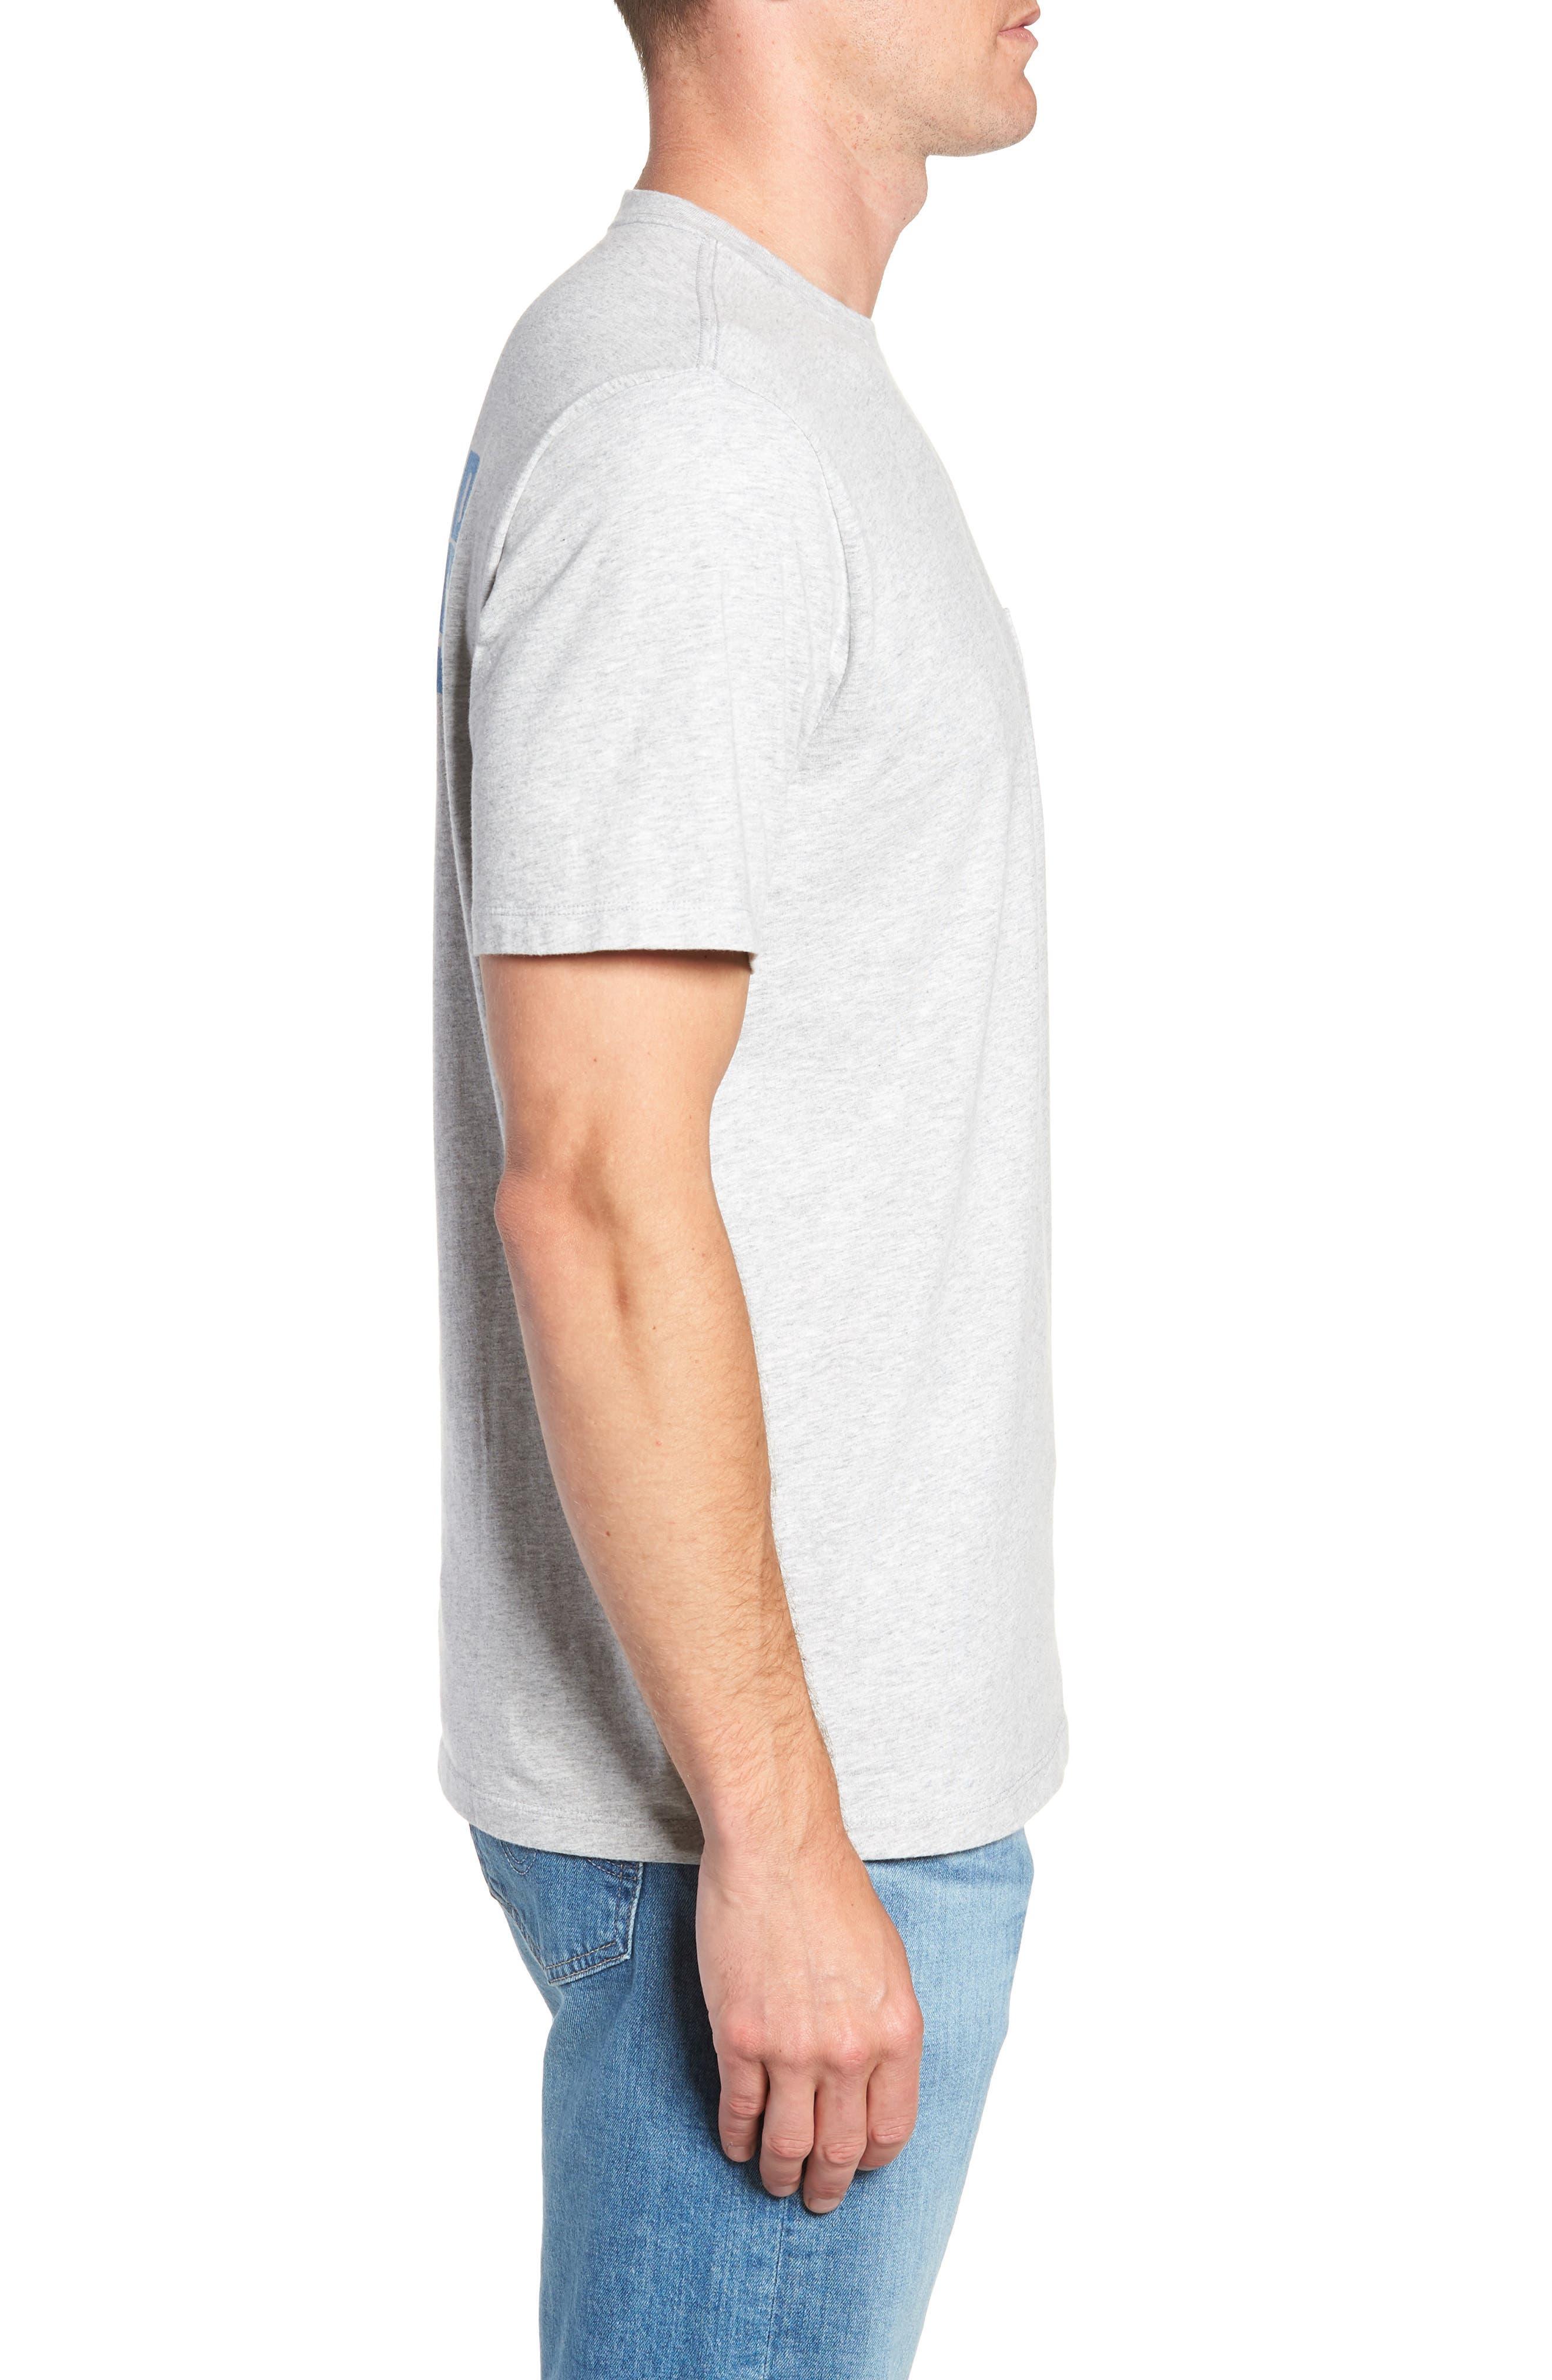 Knockout Sportfisher T-Shirt,                             Alternate thumbnail 3, color,                             GRAY HEATHER